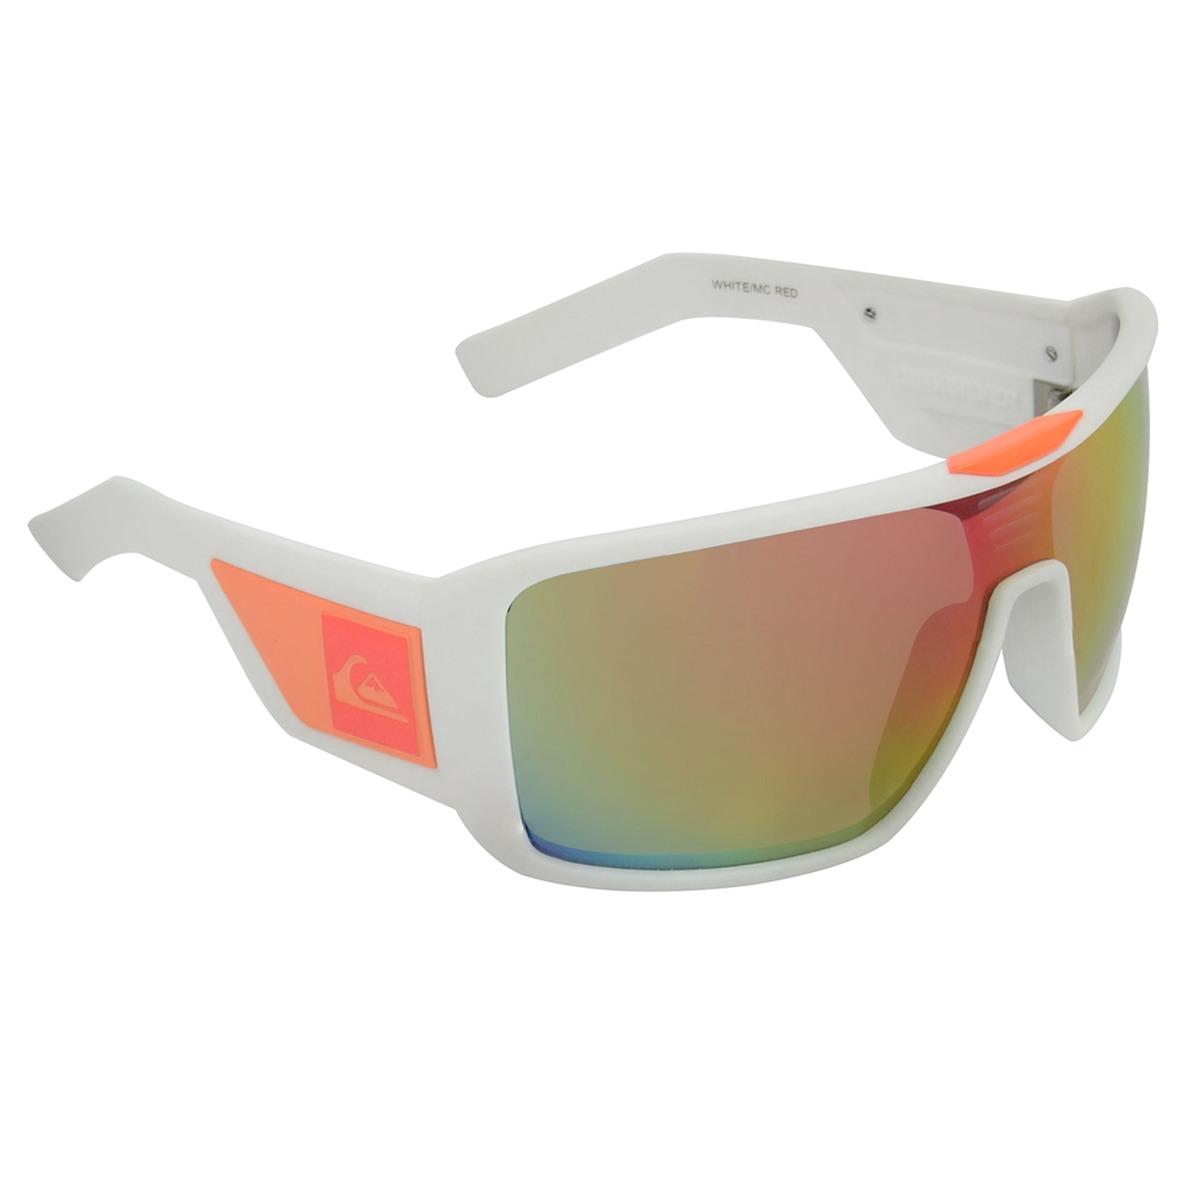 170ad3a41bd0b óculos masculino quiksilver mackin white red. Carregando zoom.